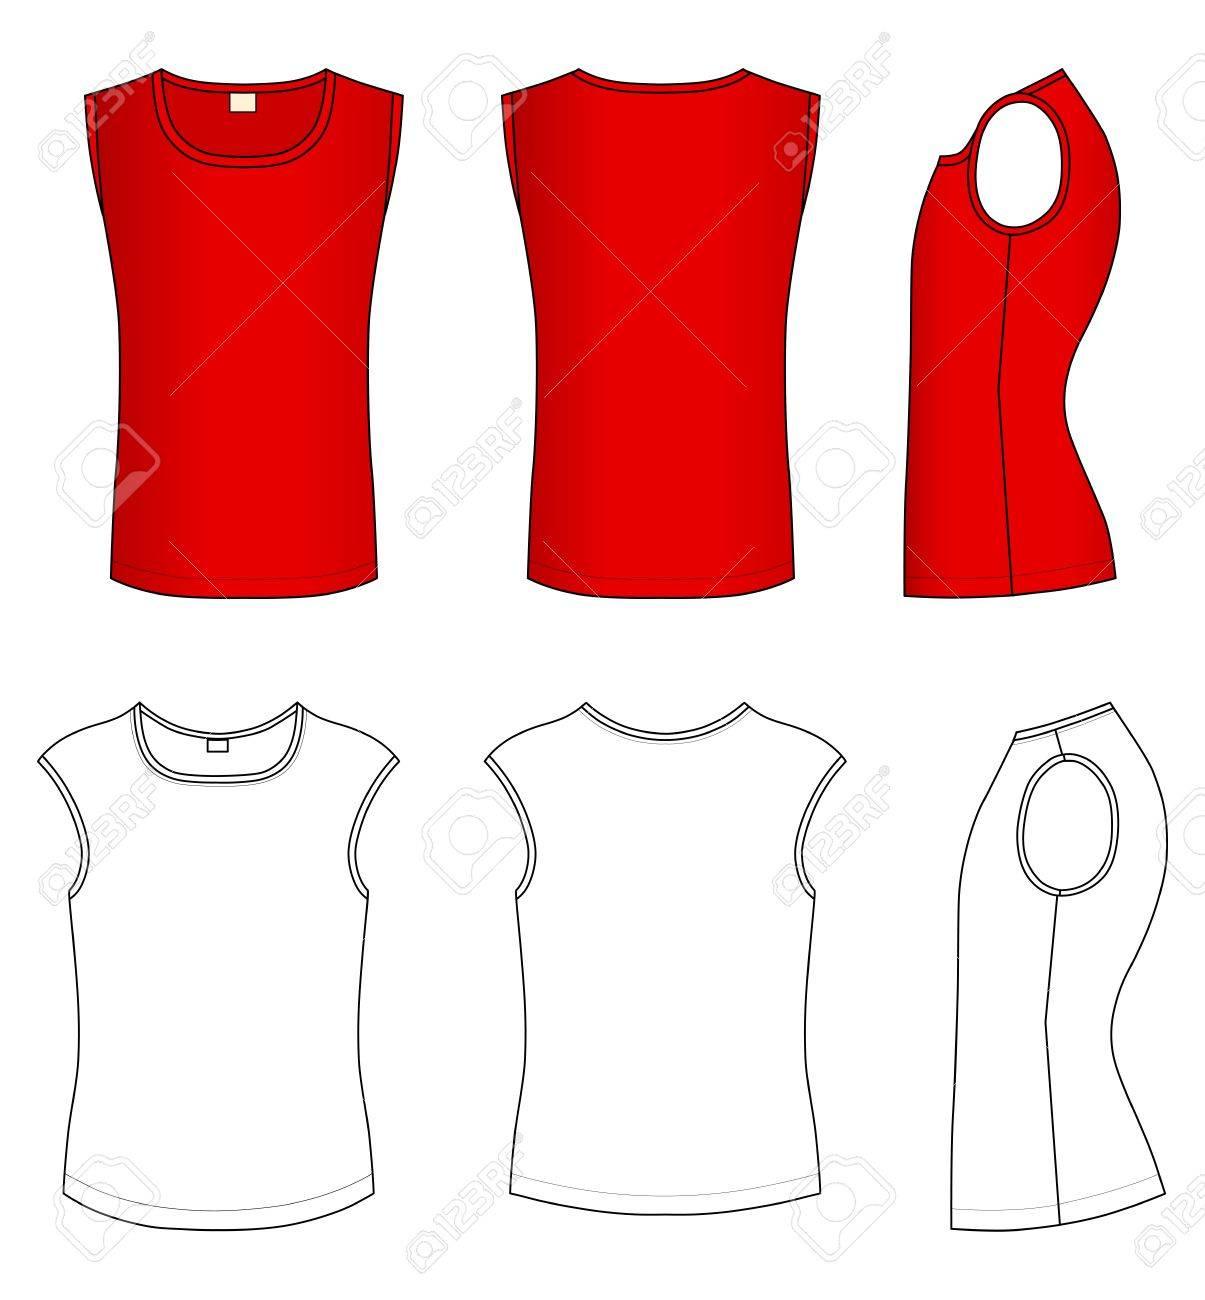 Shirt design red - Outline Red T Shirt Vector Illustration Isolated On White Stock Vector 11357562